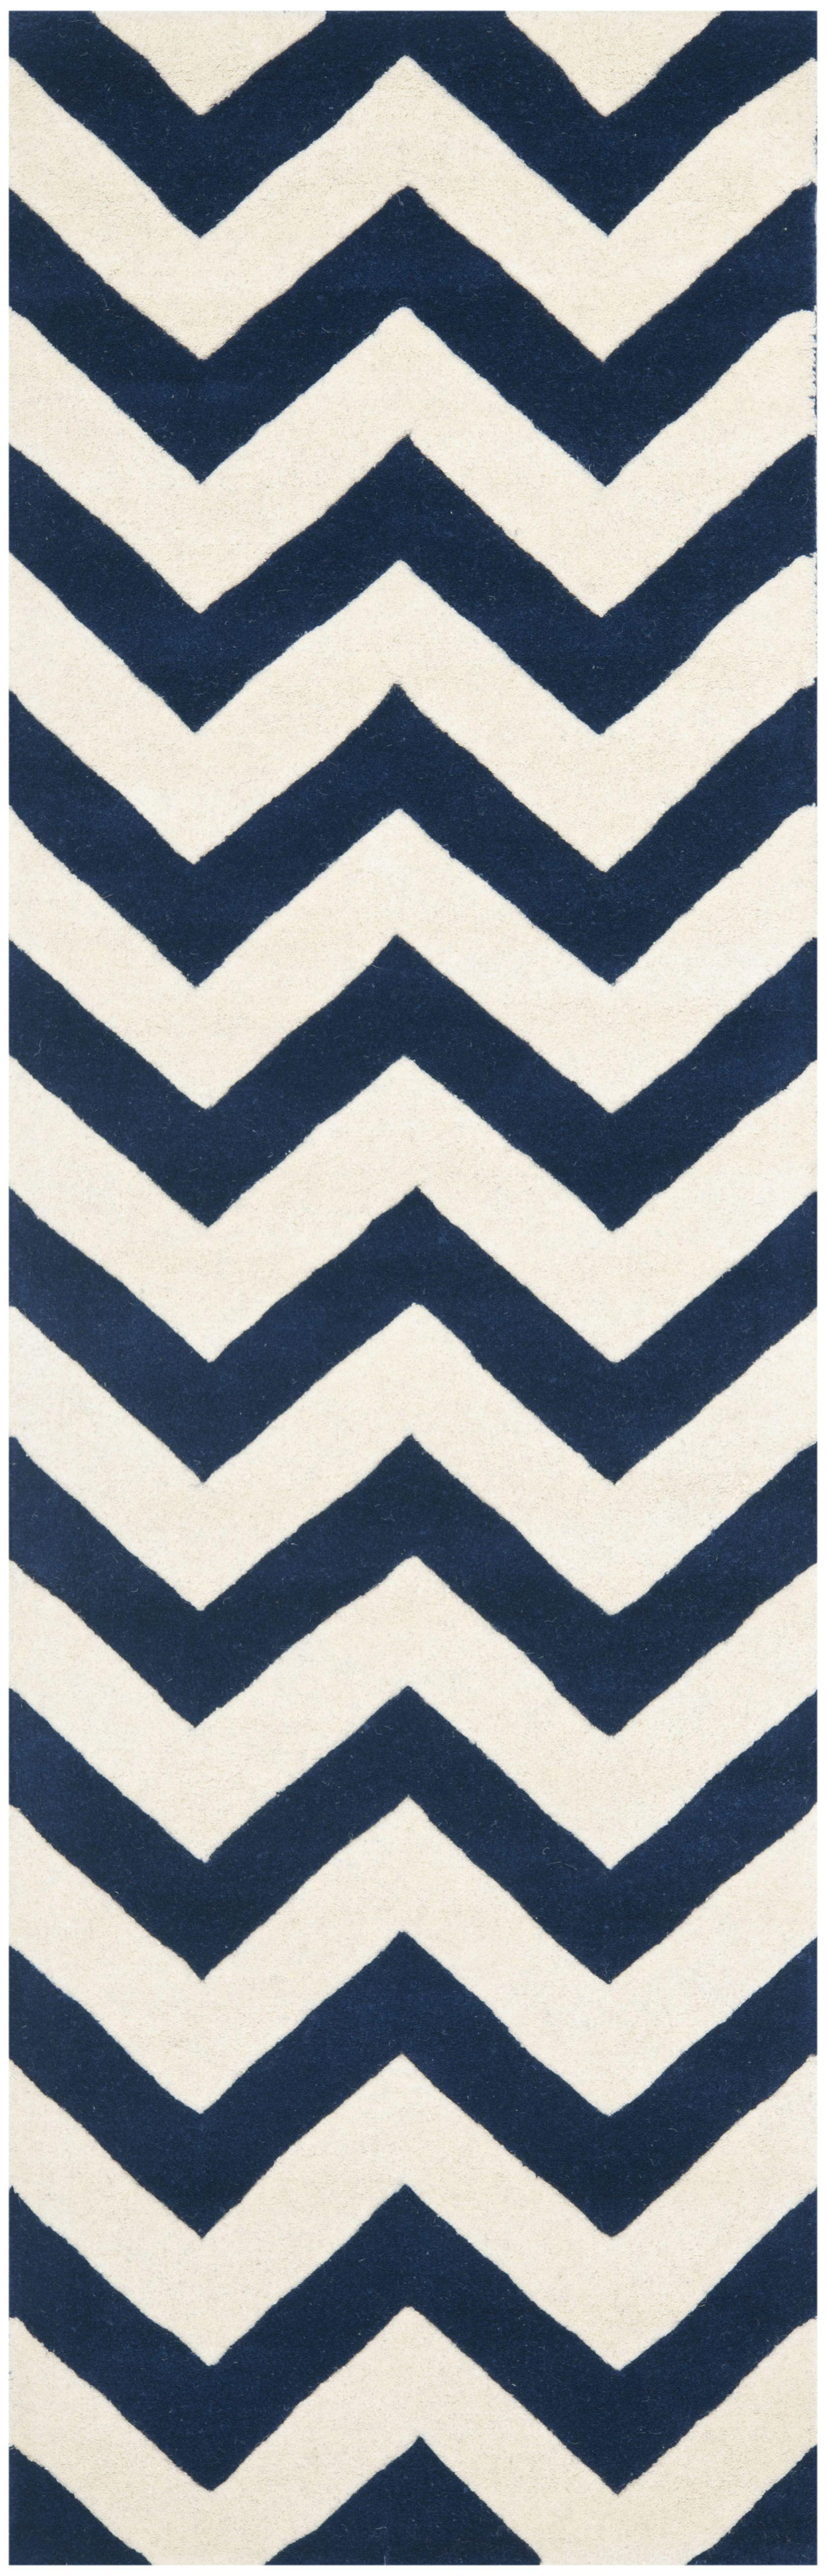 Wilkin Hand Tufted Wool Dark Blue/Ivory Area Rug Rug Size: Runner 2'3